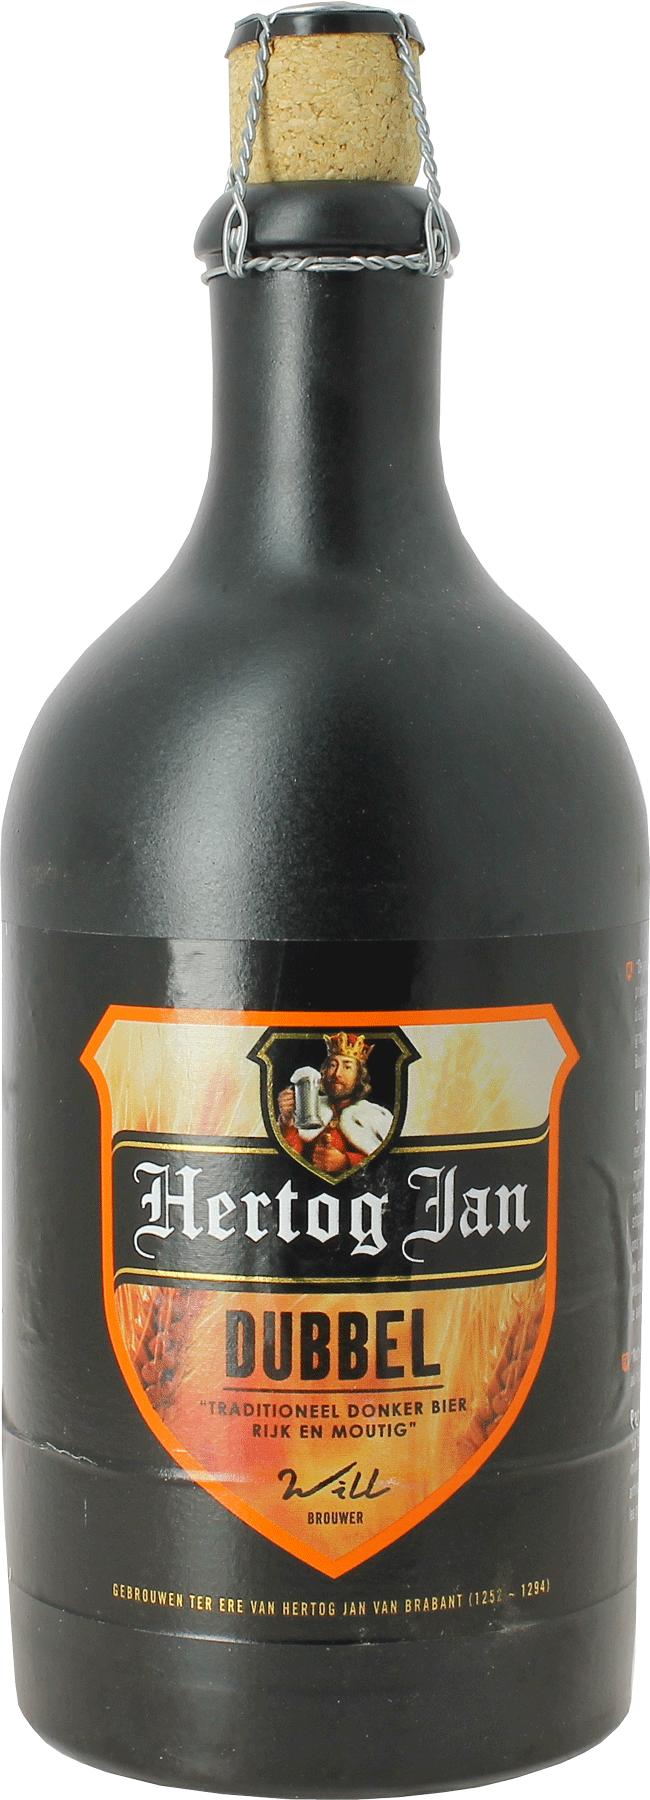 Hertog Jan Dubbel